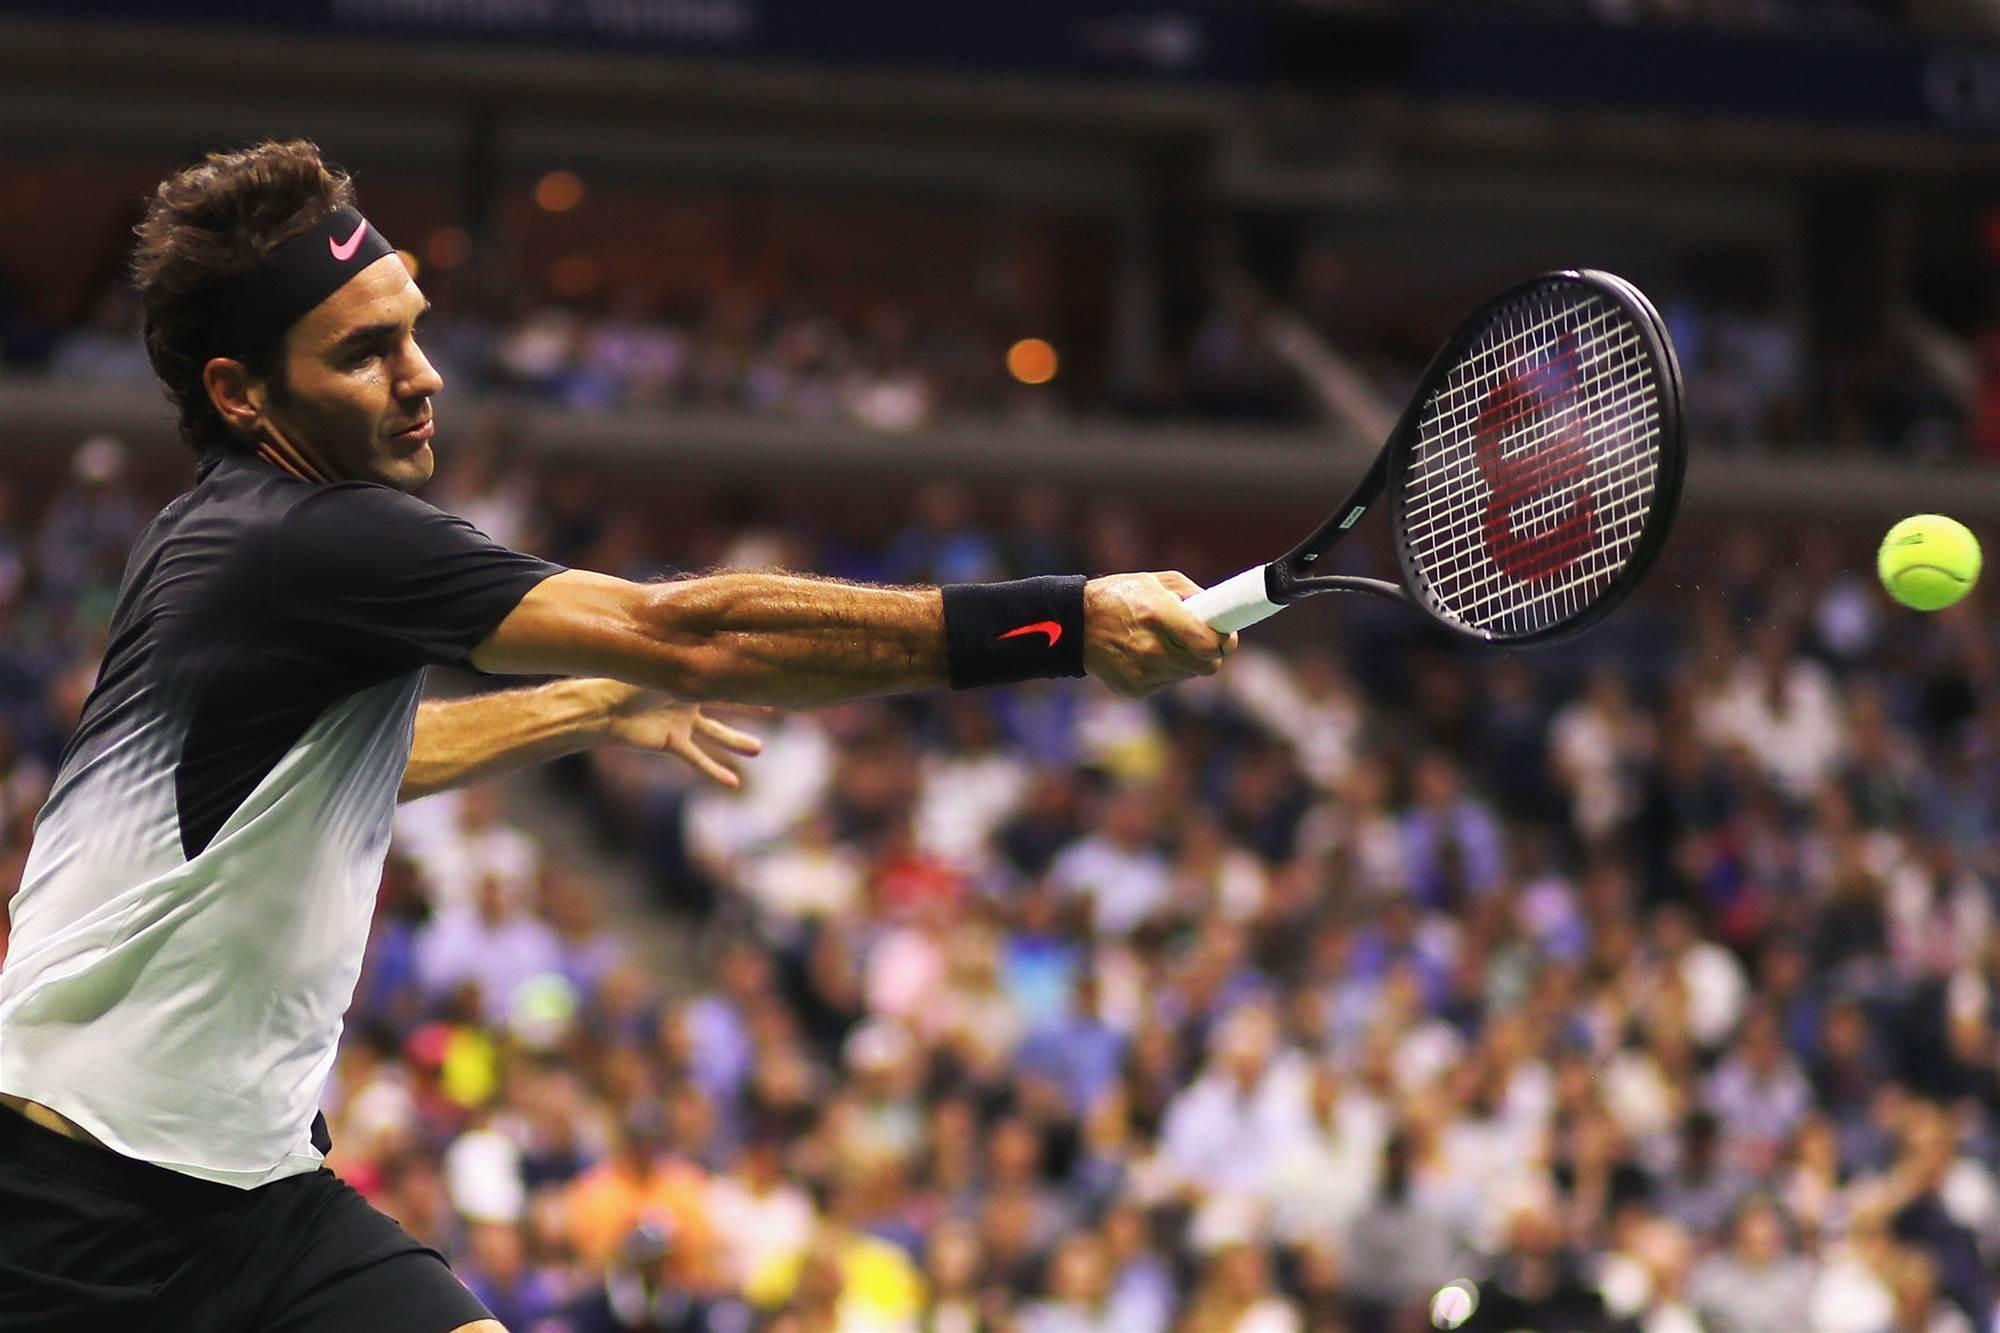 Federer's injury scare